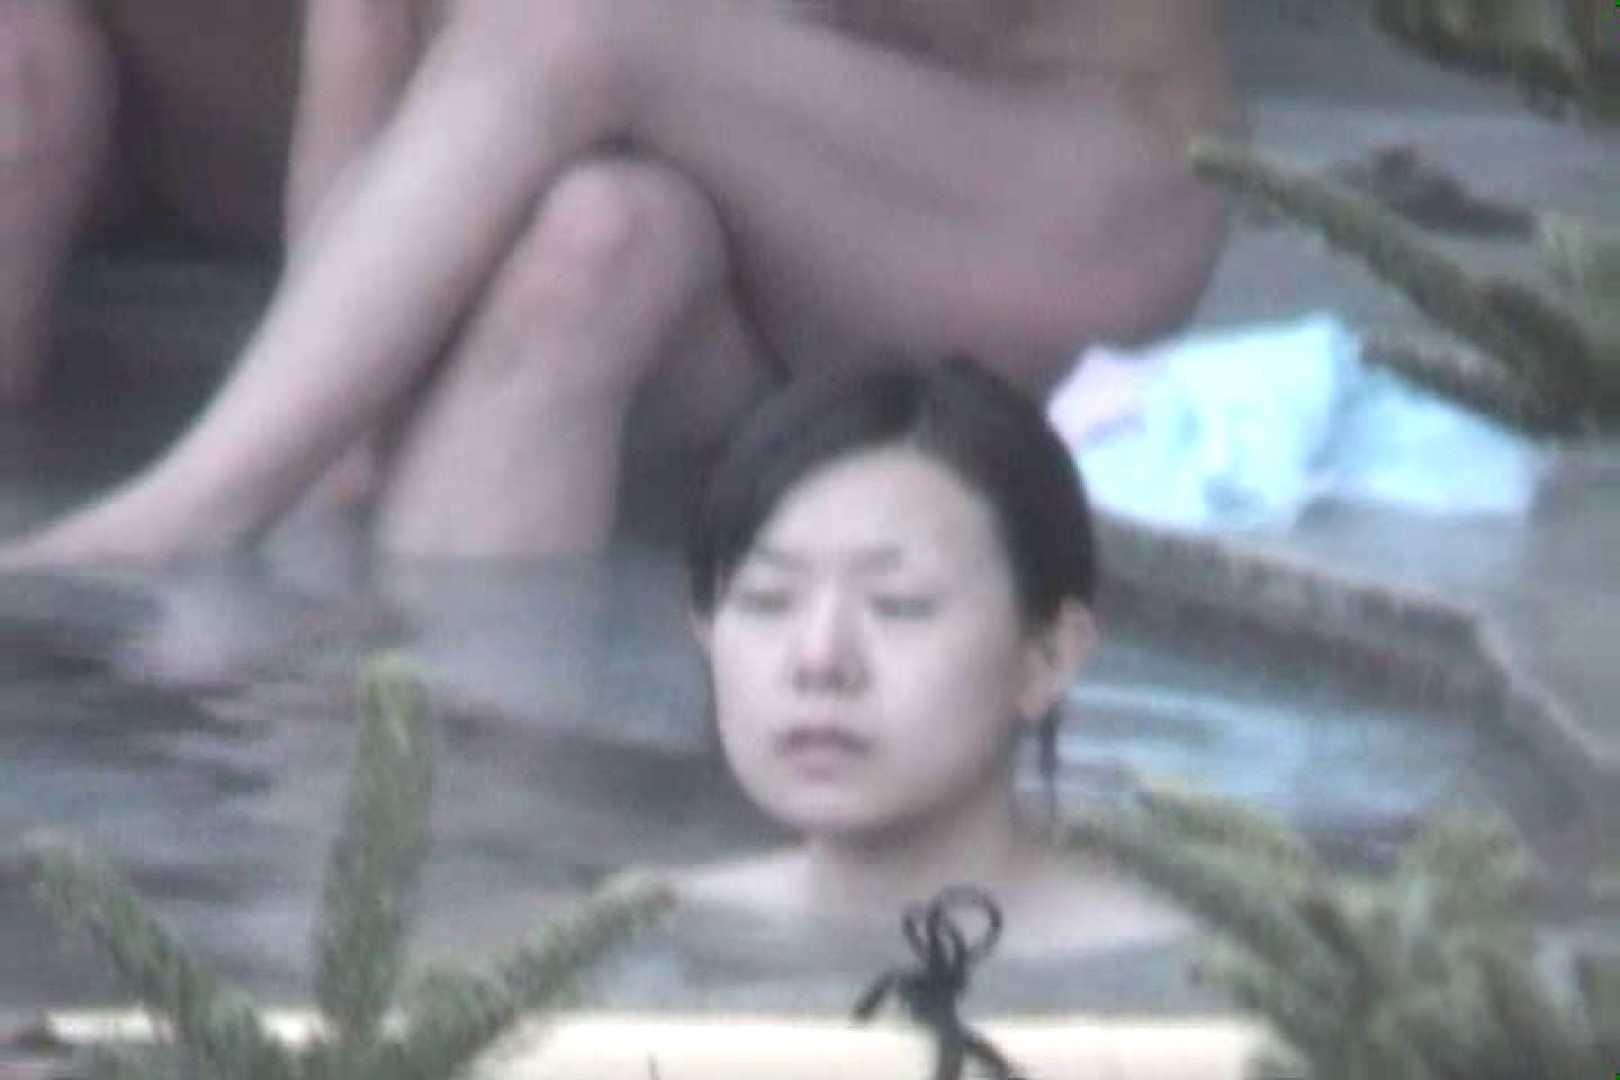 Aquaな露天風呂Vol.609 盗撮映像  58Pix 7